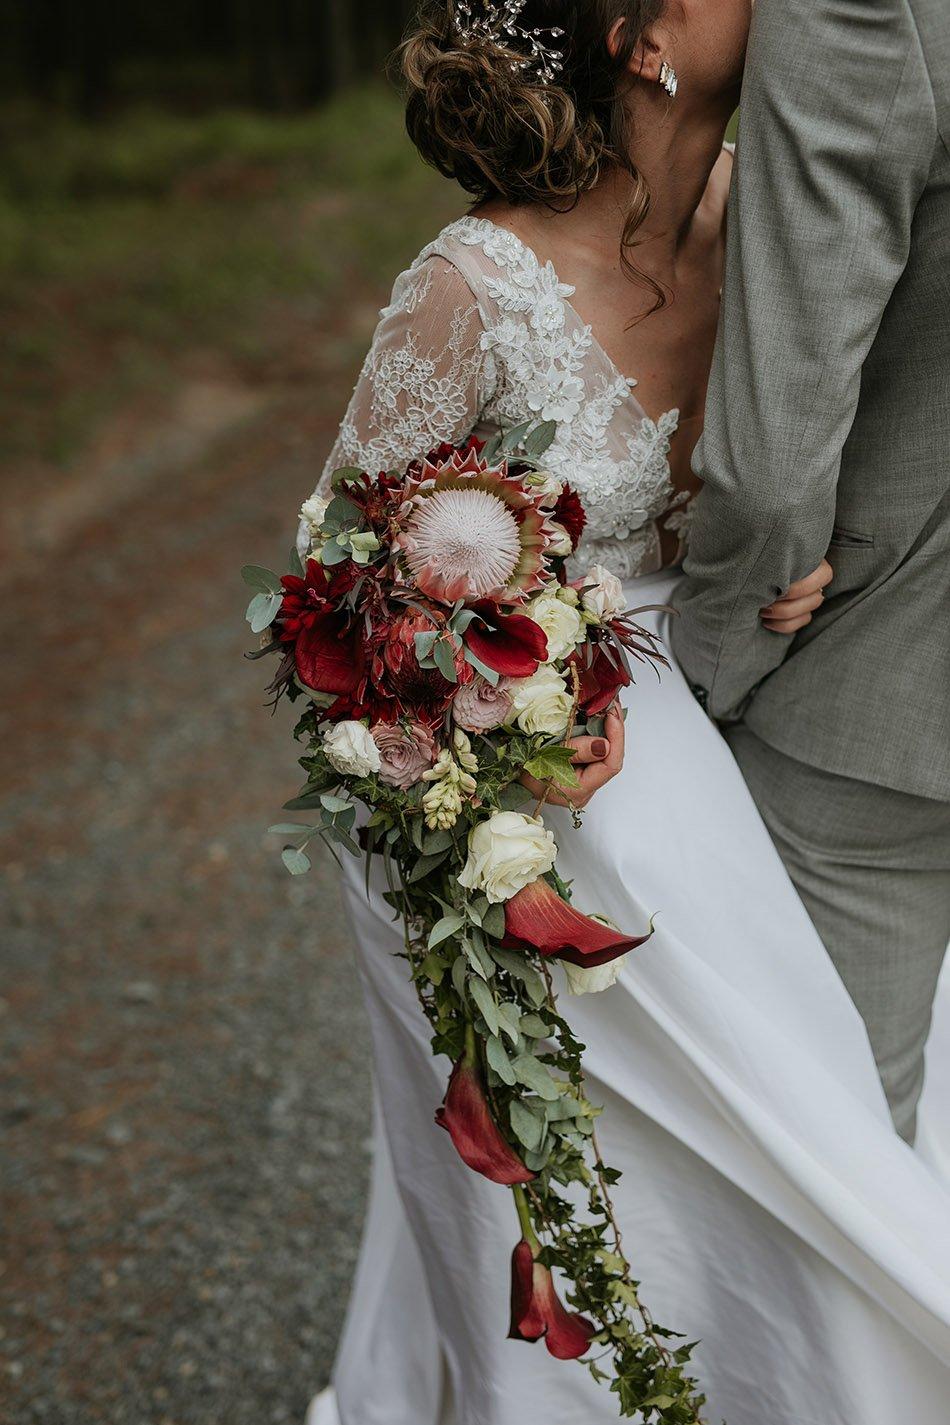 Corrie Lynn Farm Wedding - KZN Wedding Photographer - Duane Smith Photography - Andrea & Sean-1359